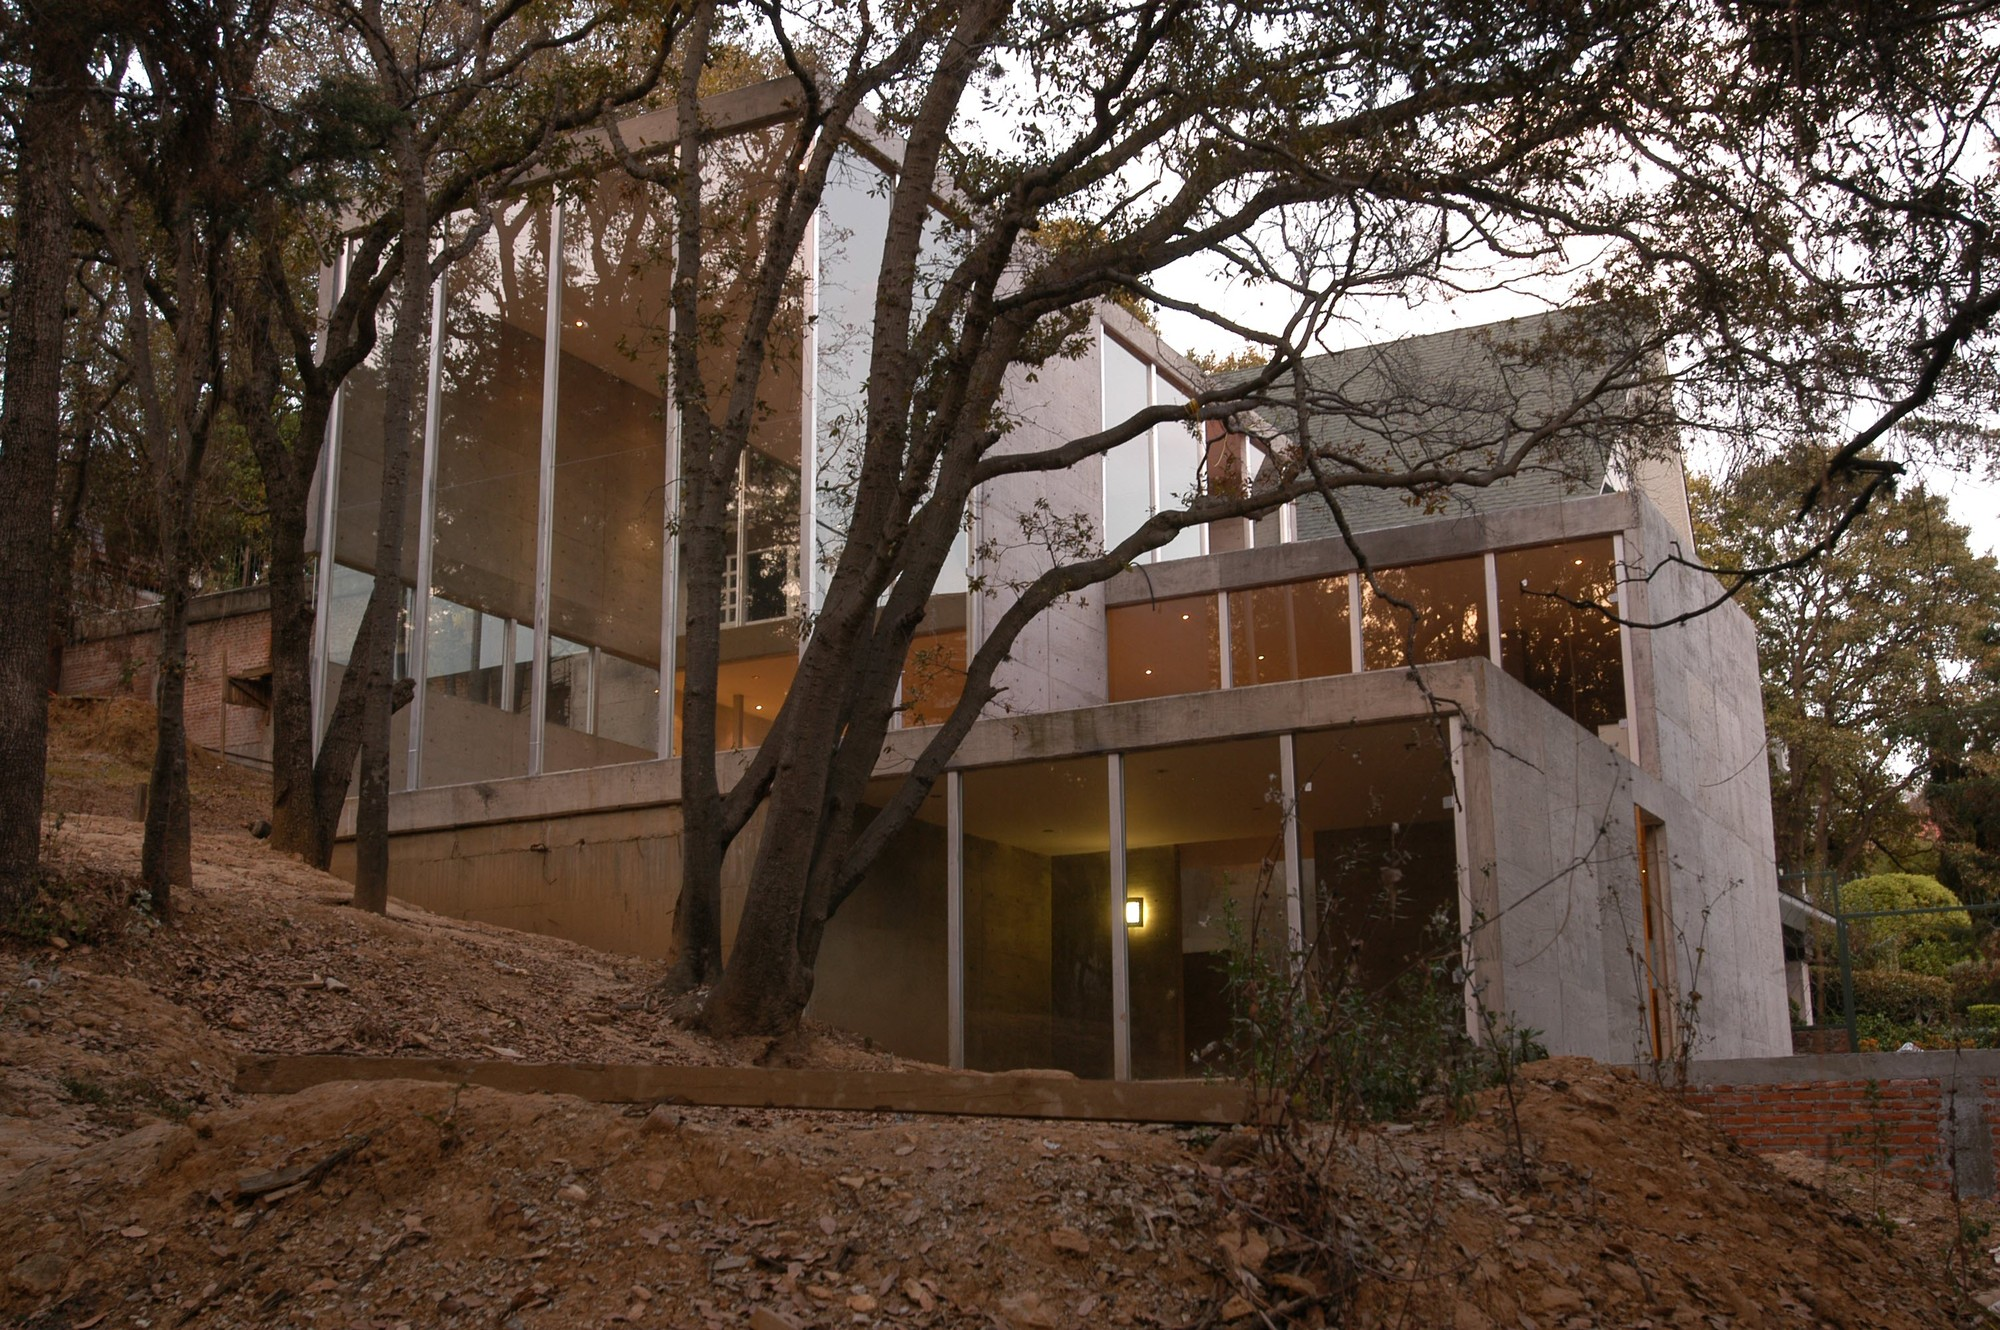 Sayavedra House / Taller de Arquitectura-Mauricio Rocha, Courtesy of Taller De Arquitectura- Mauricio Rocha